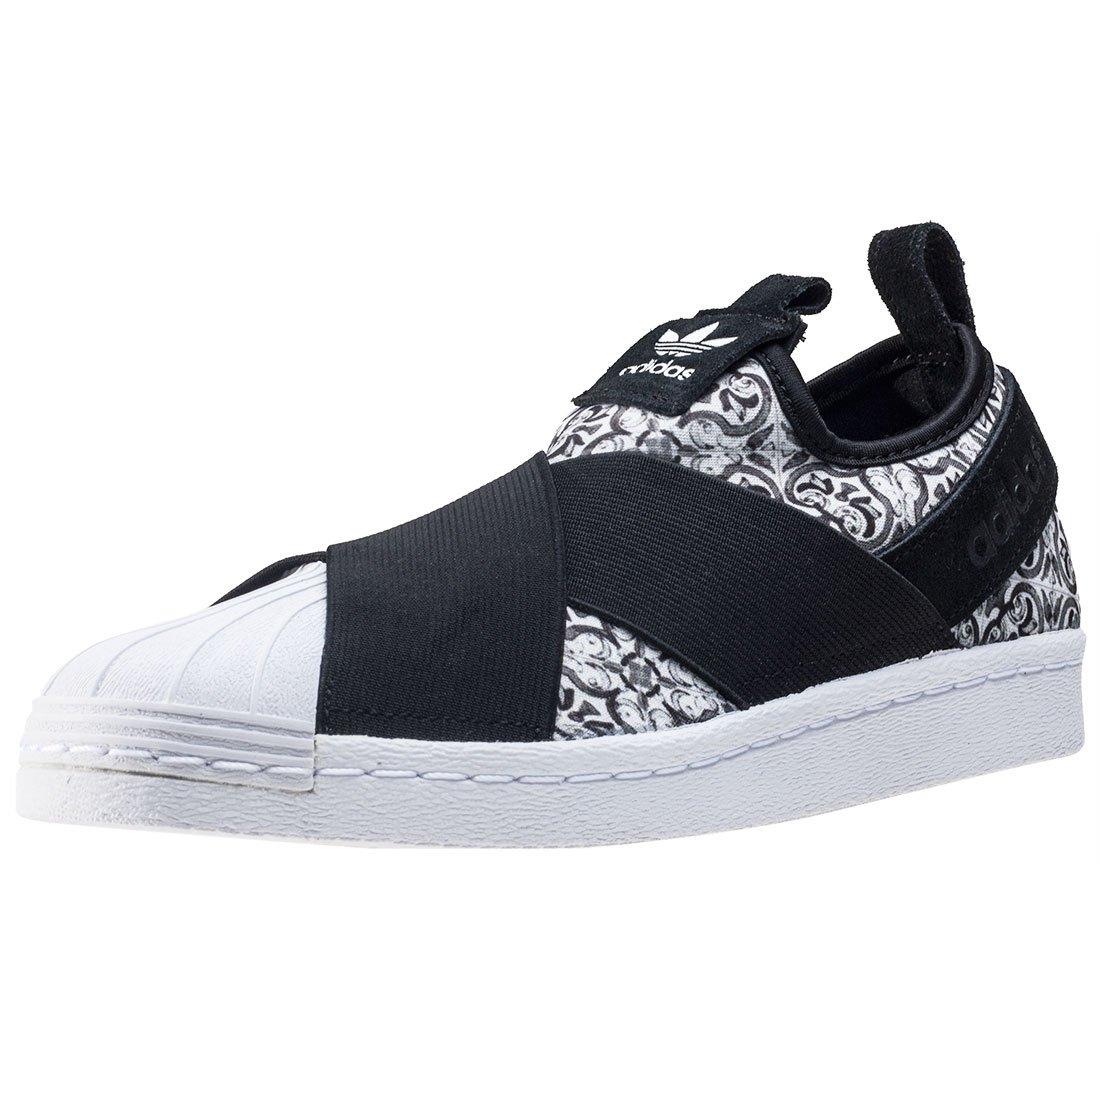 Adidas Superstar Slipon W, Zapatillas de Deporte Para Mujer 38 EU|Negro (Negbas/Negbas/Ftwbla)